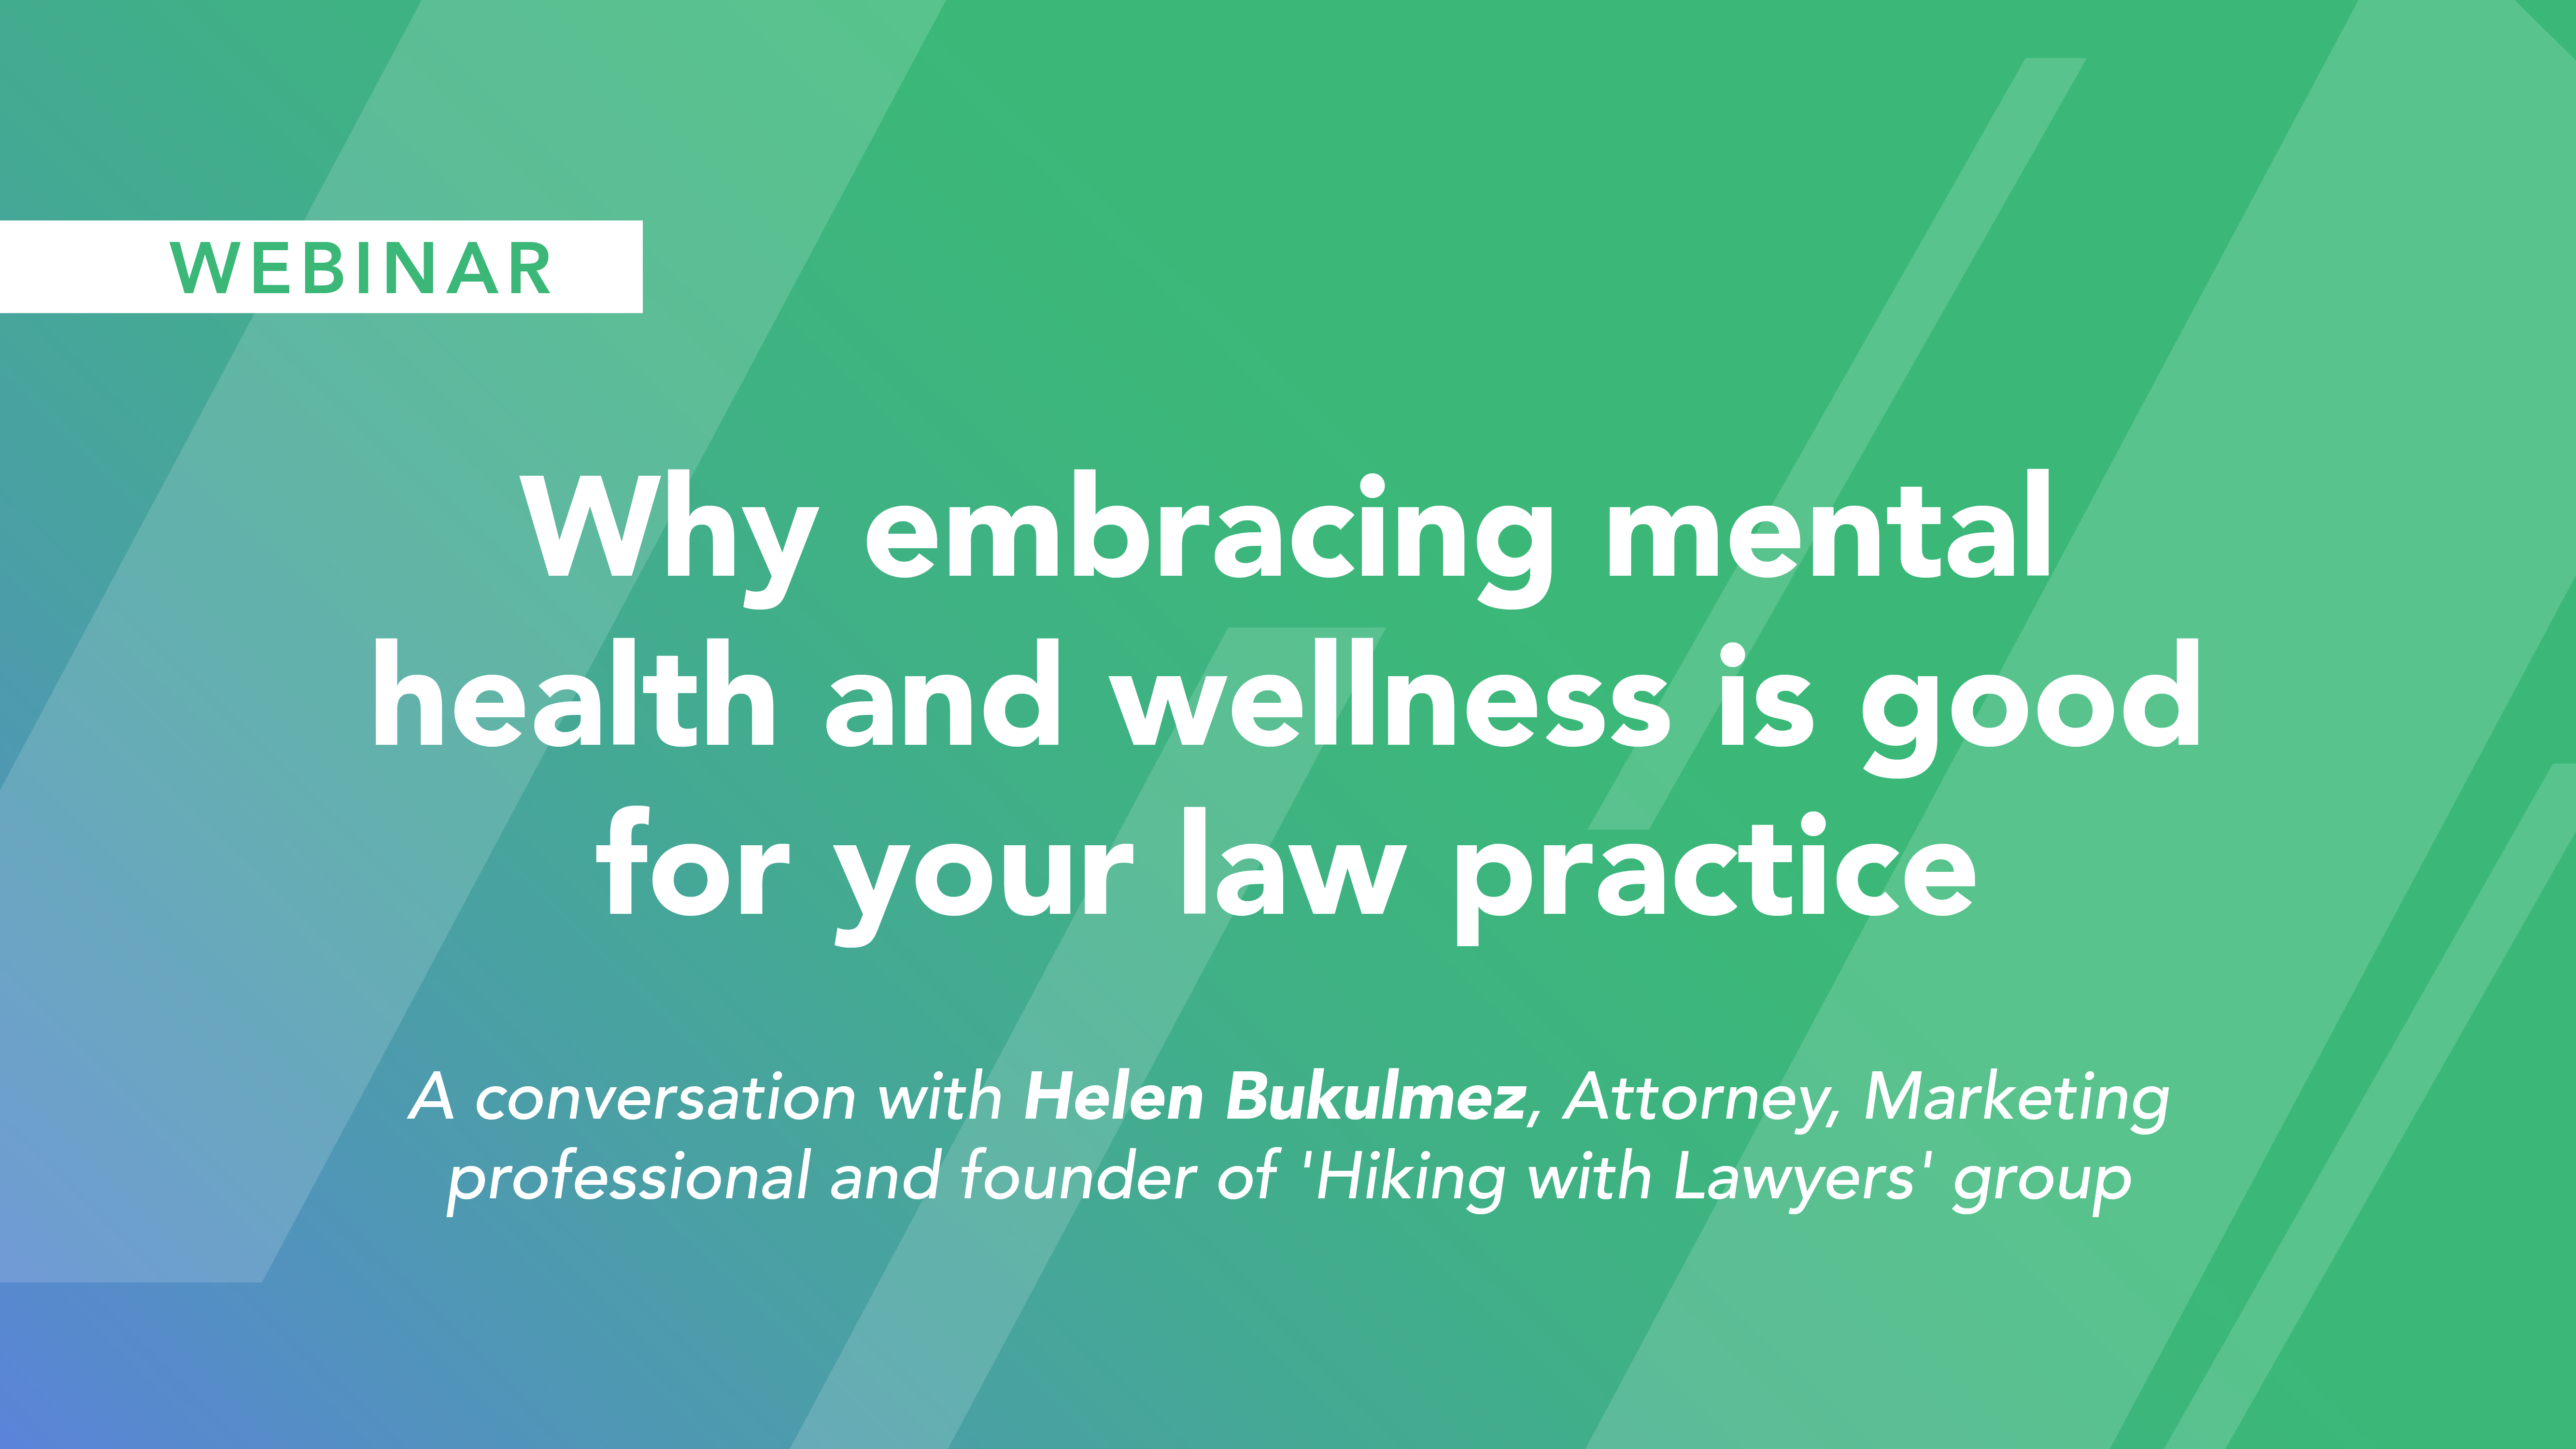 A Conversation with Helen Bukulmez